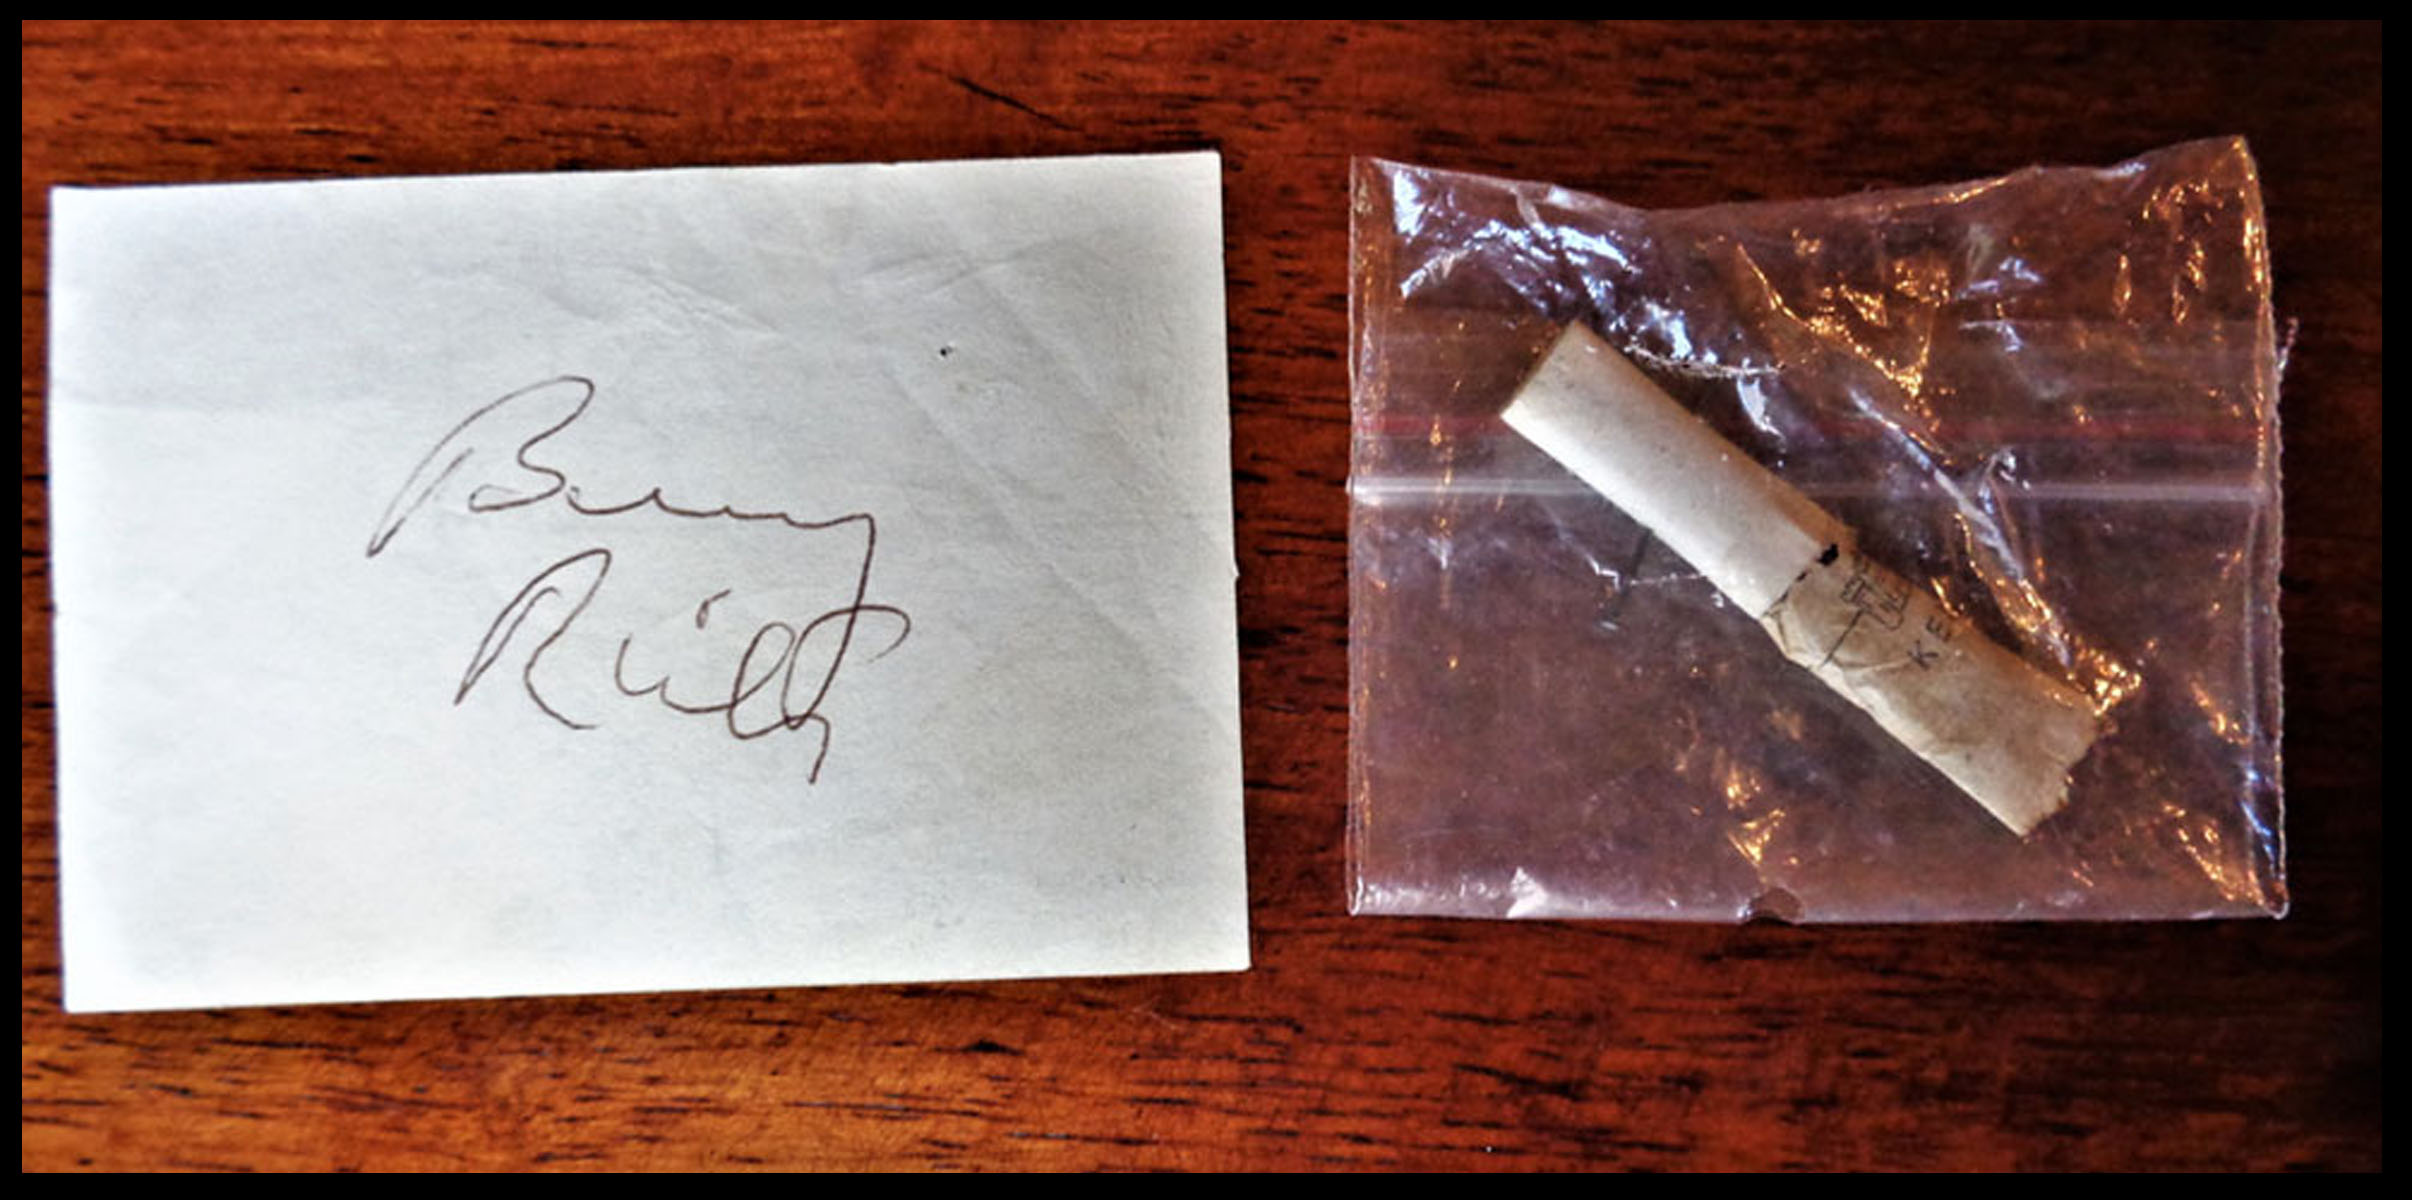 JR-Buddy-Autograph & Cigarette.jpg